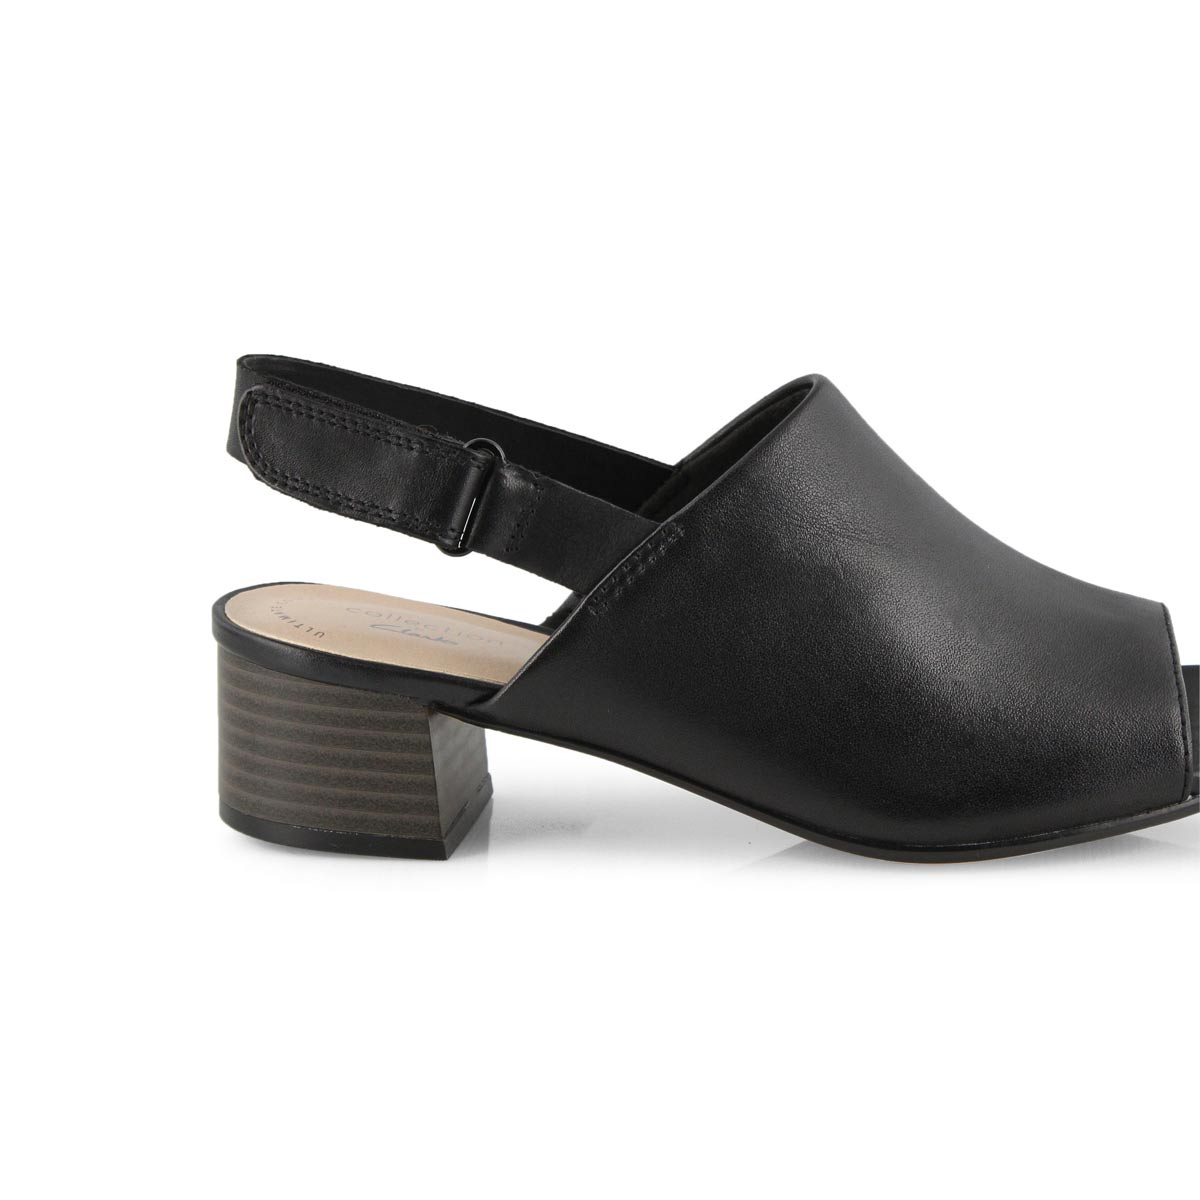 Women's Elisa Lyndsey Dress Sandal - Black